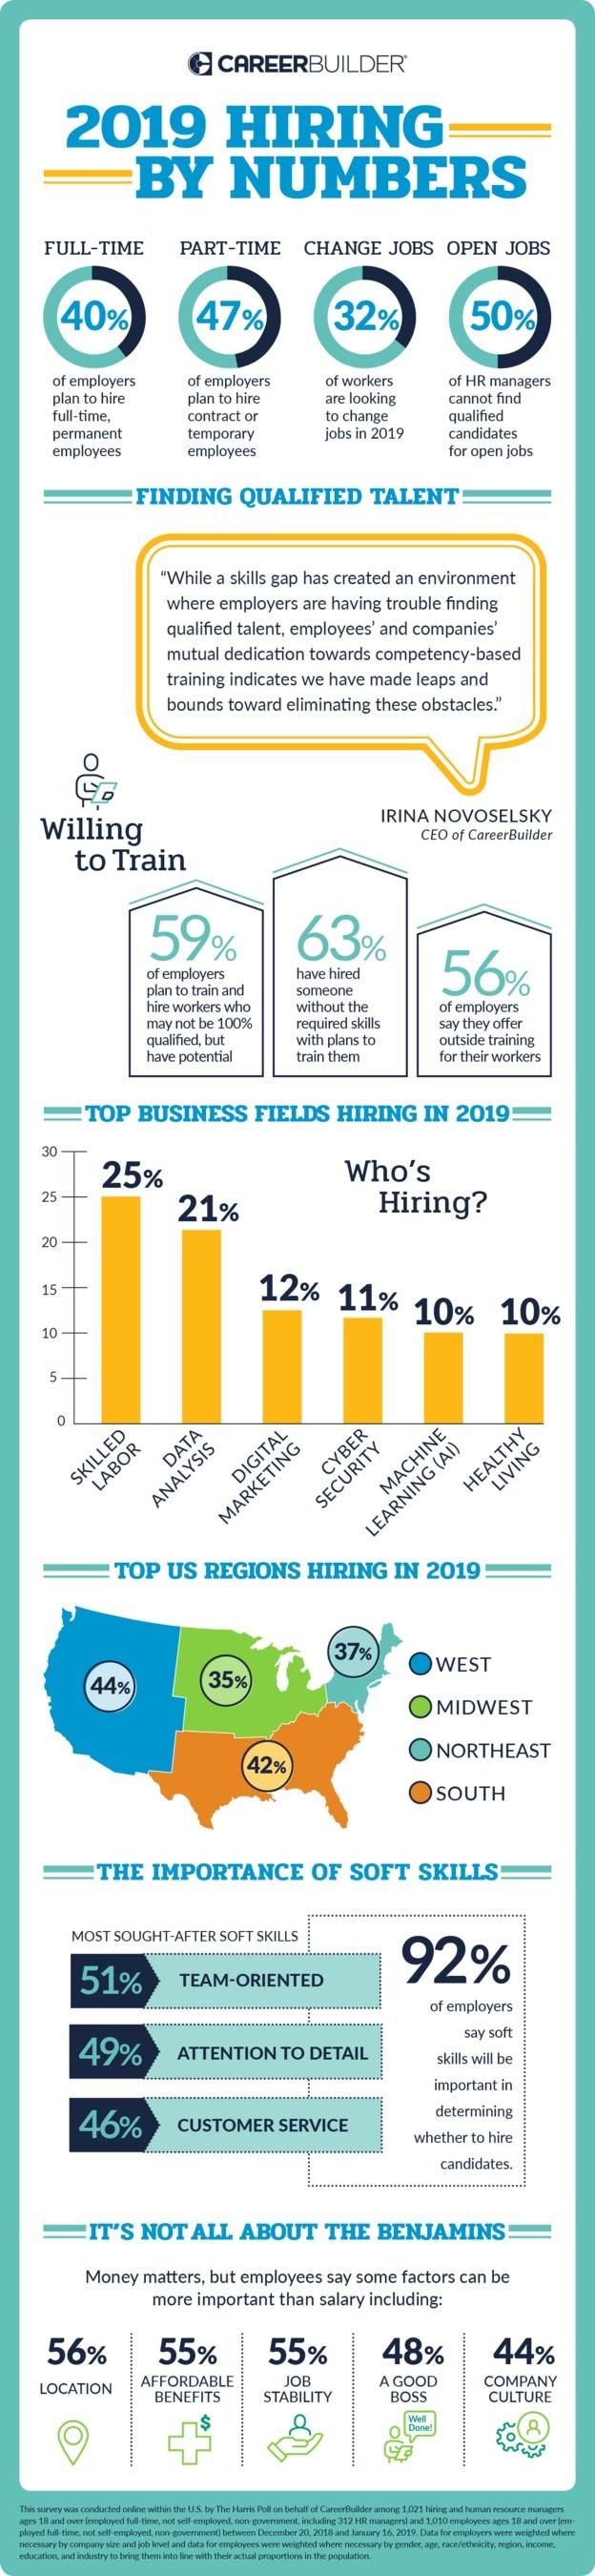 2019 Hiring By Numbers